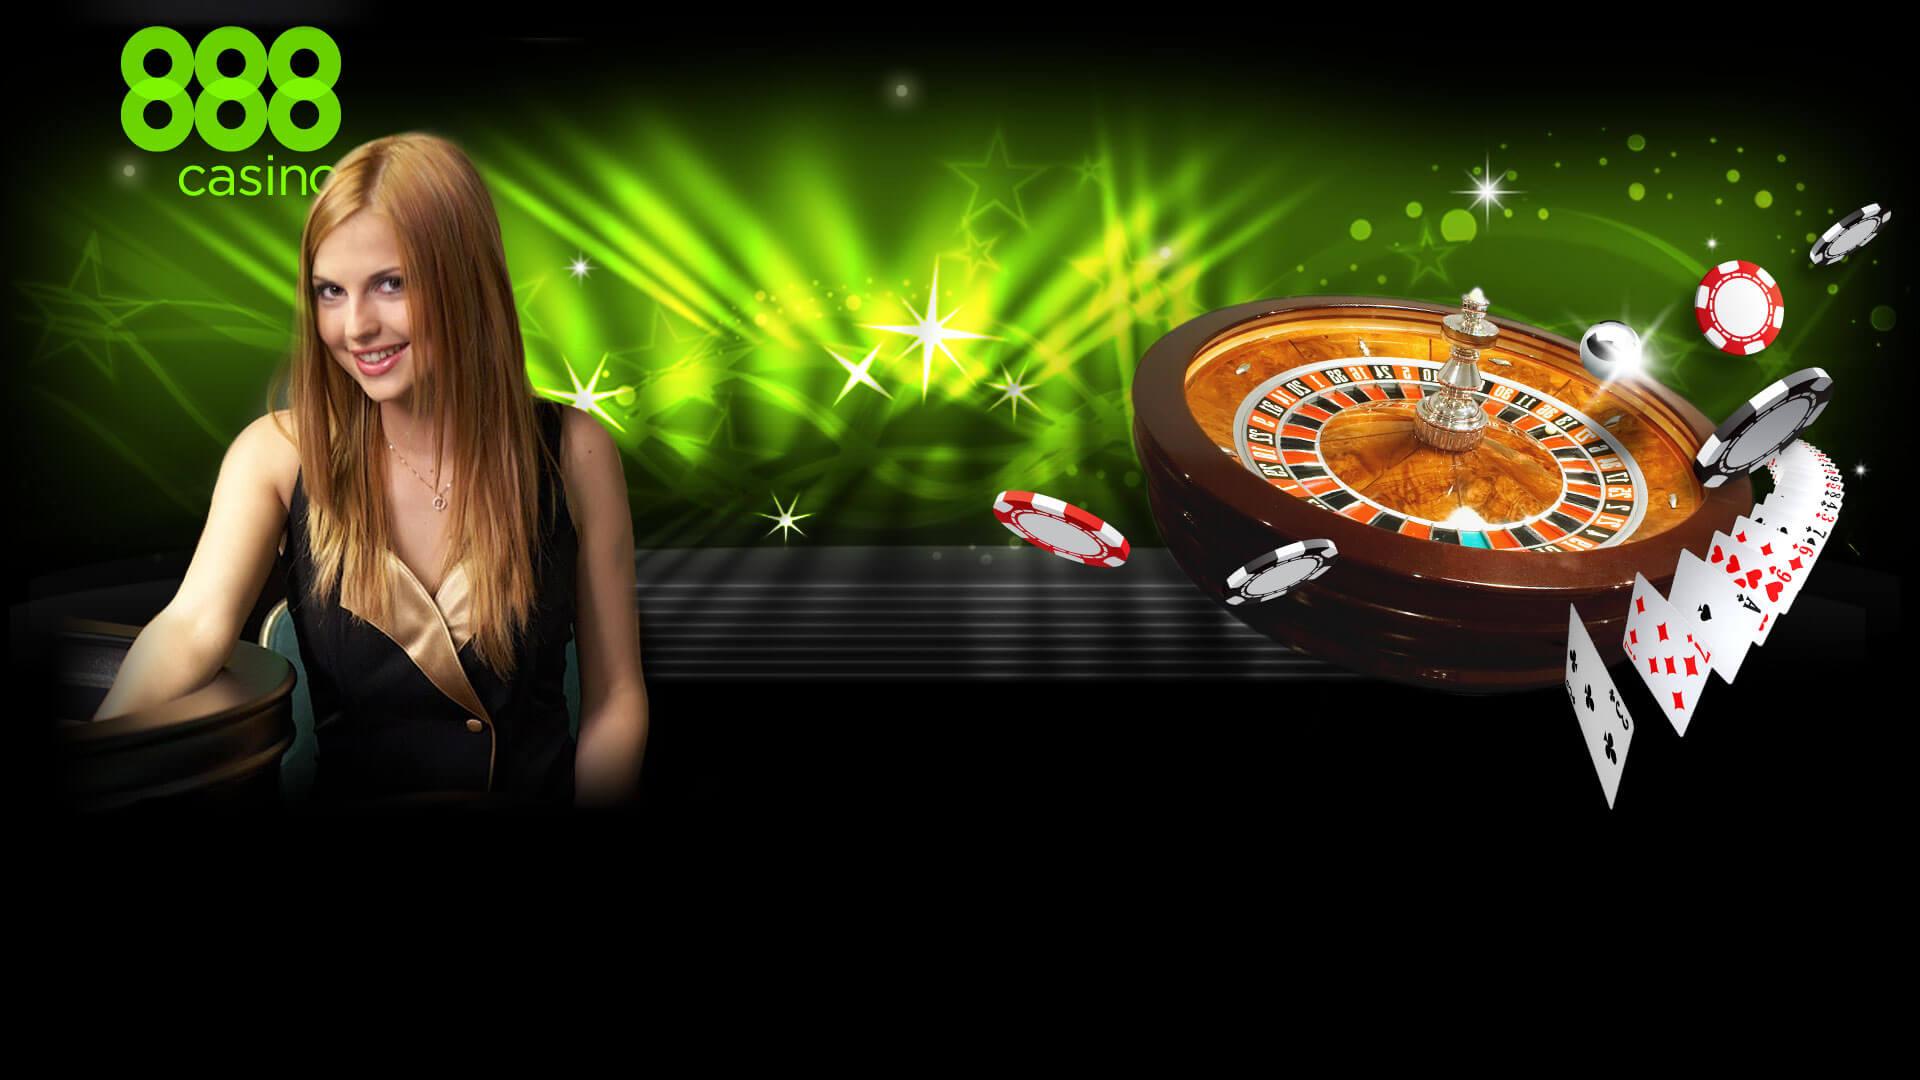 online casino paypal casino games gratis